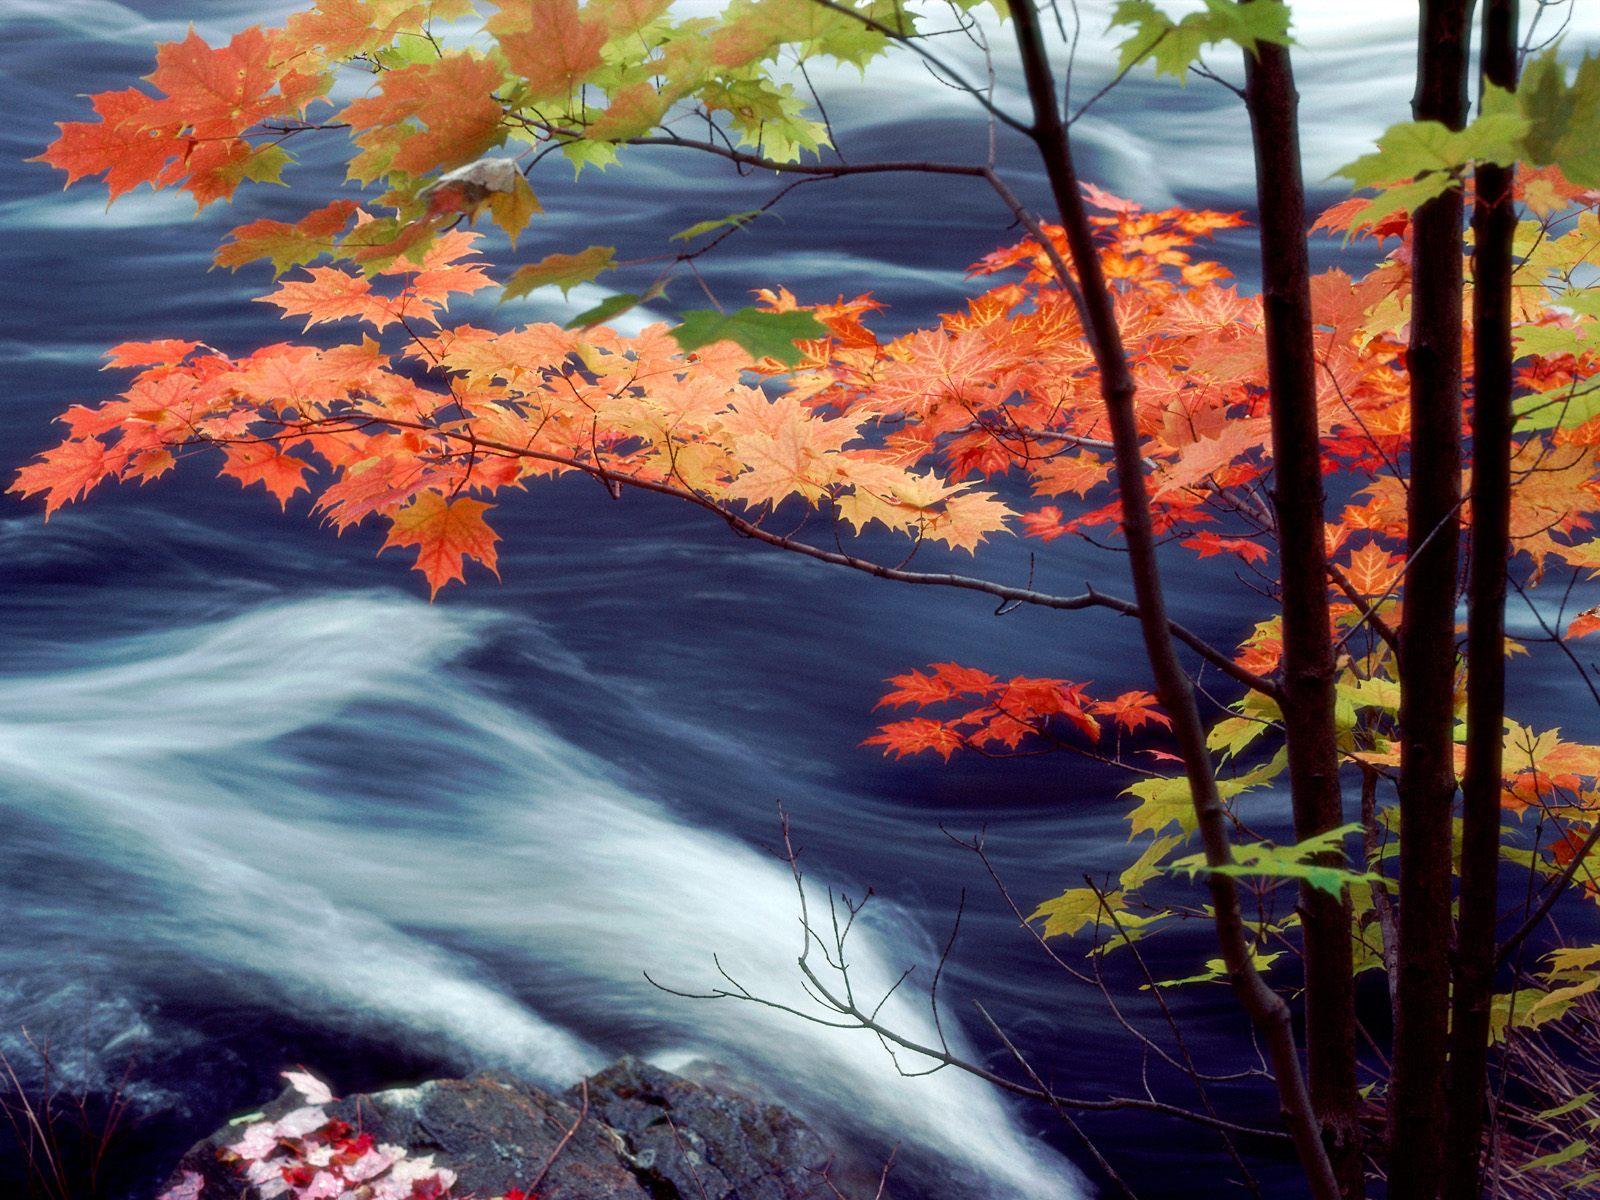 The best top autumn desktop wallpapers 26 En Güzel Sonbahar HD Duvar Kağıtları